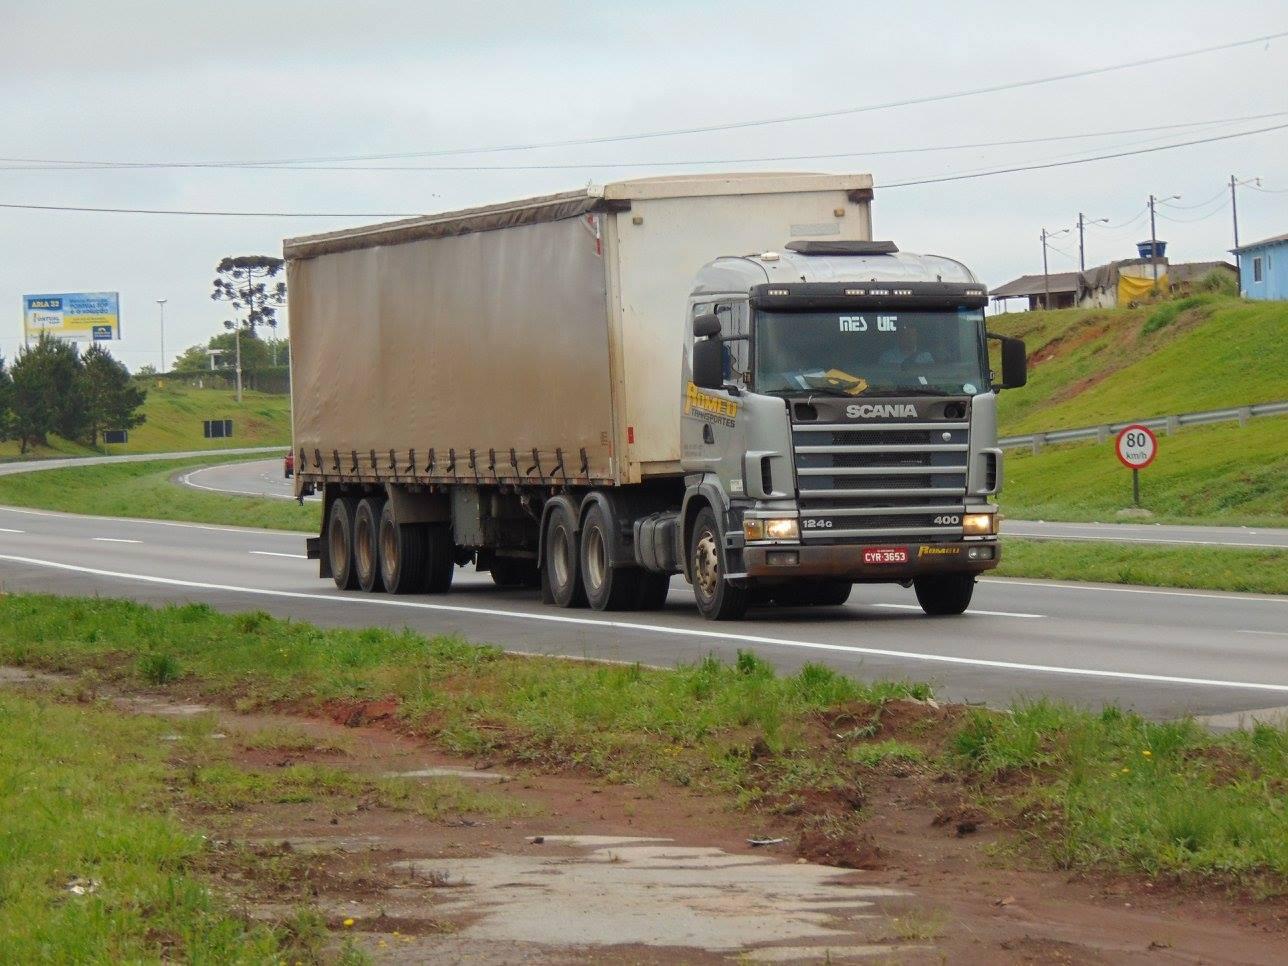 Scania-photo-5-1--2015-20